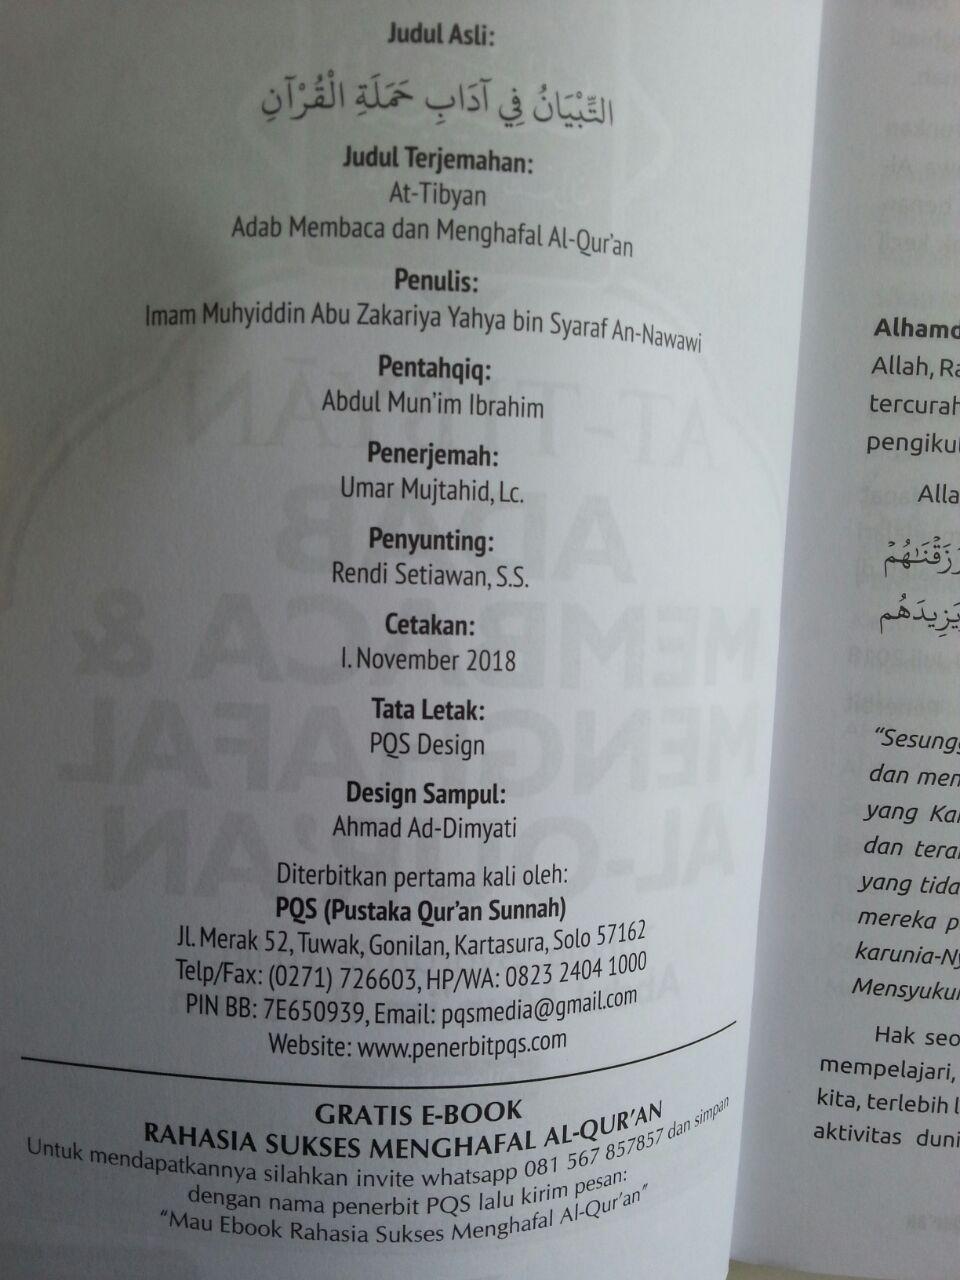 Buku At-Tibyan Adab Membaca Dan Menghafal Al-Qur'an isi 2